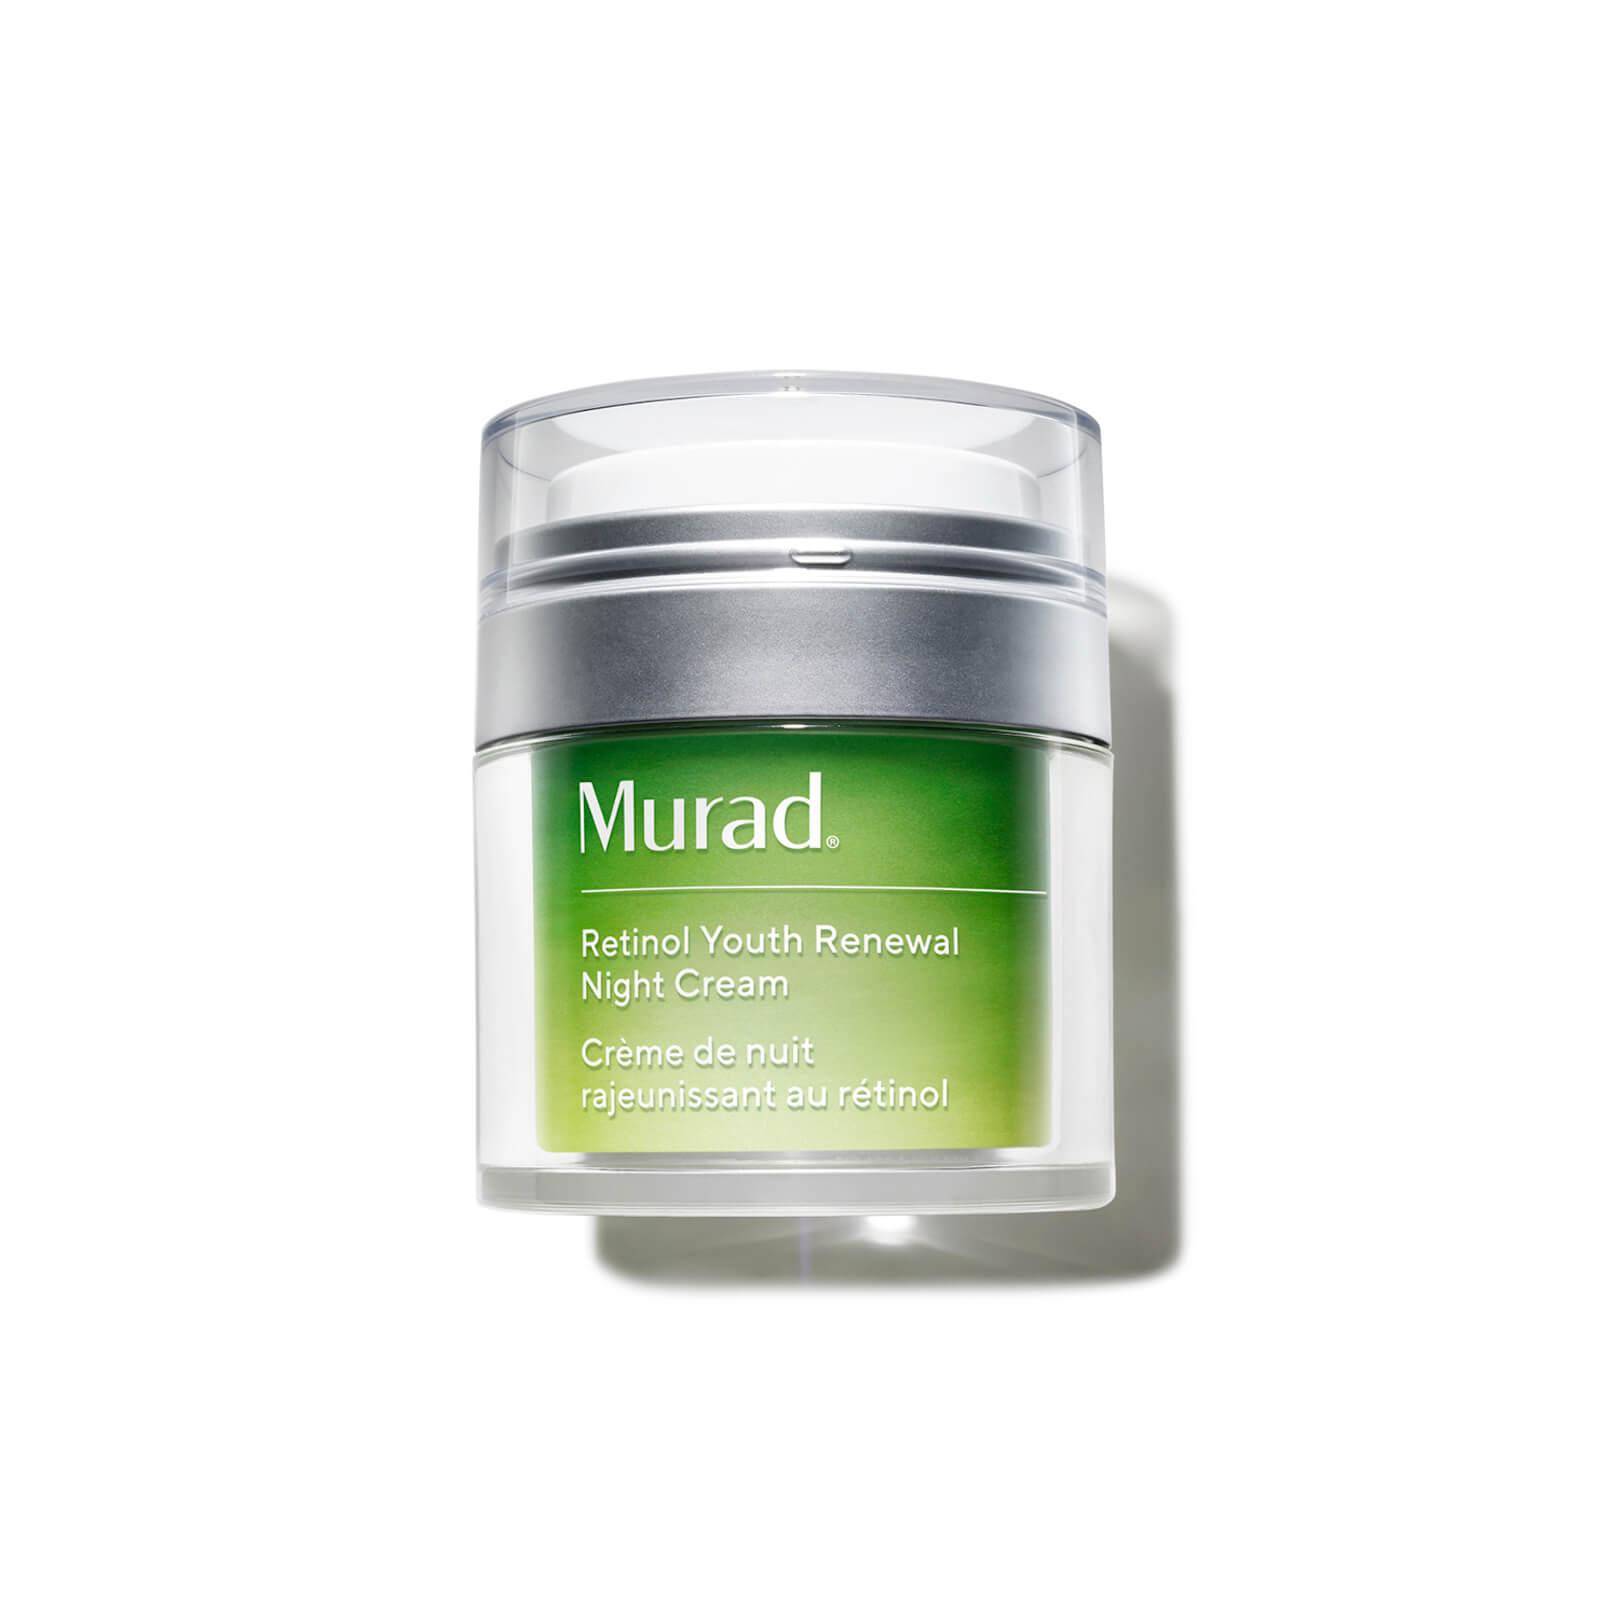 Купить Murad Retinol Youth Renewal Night Cream 50ml